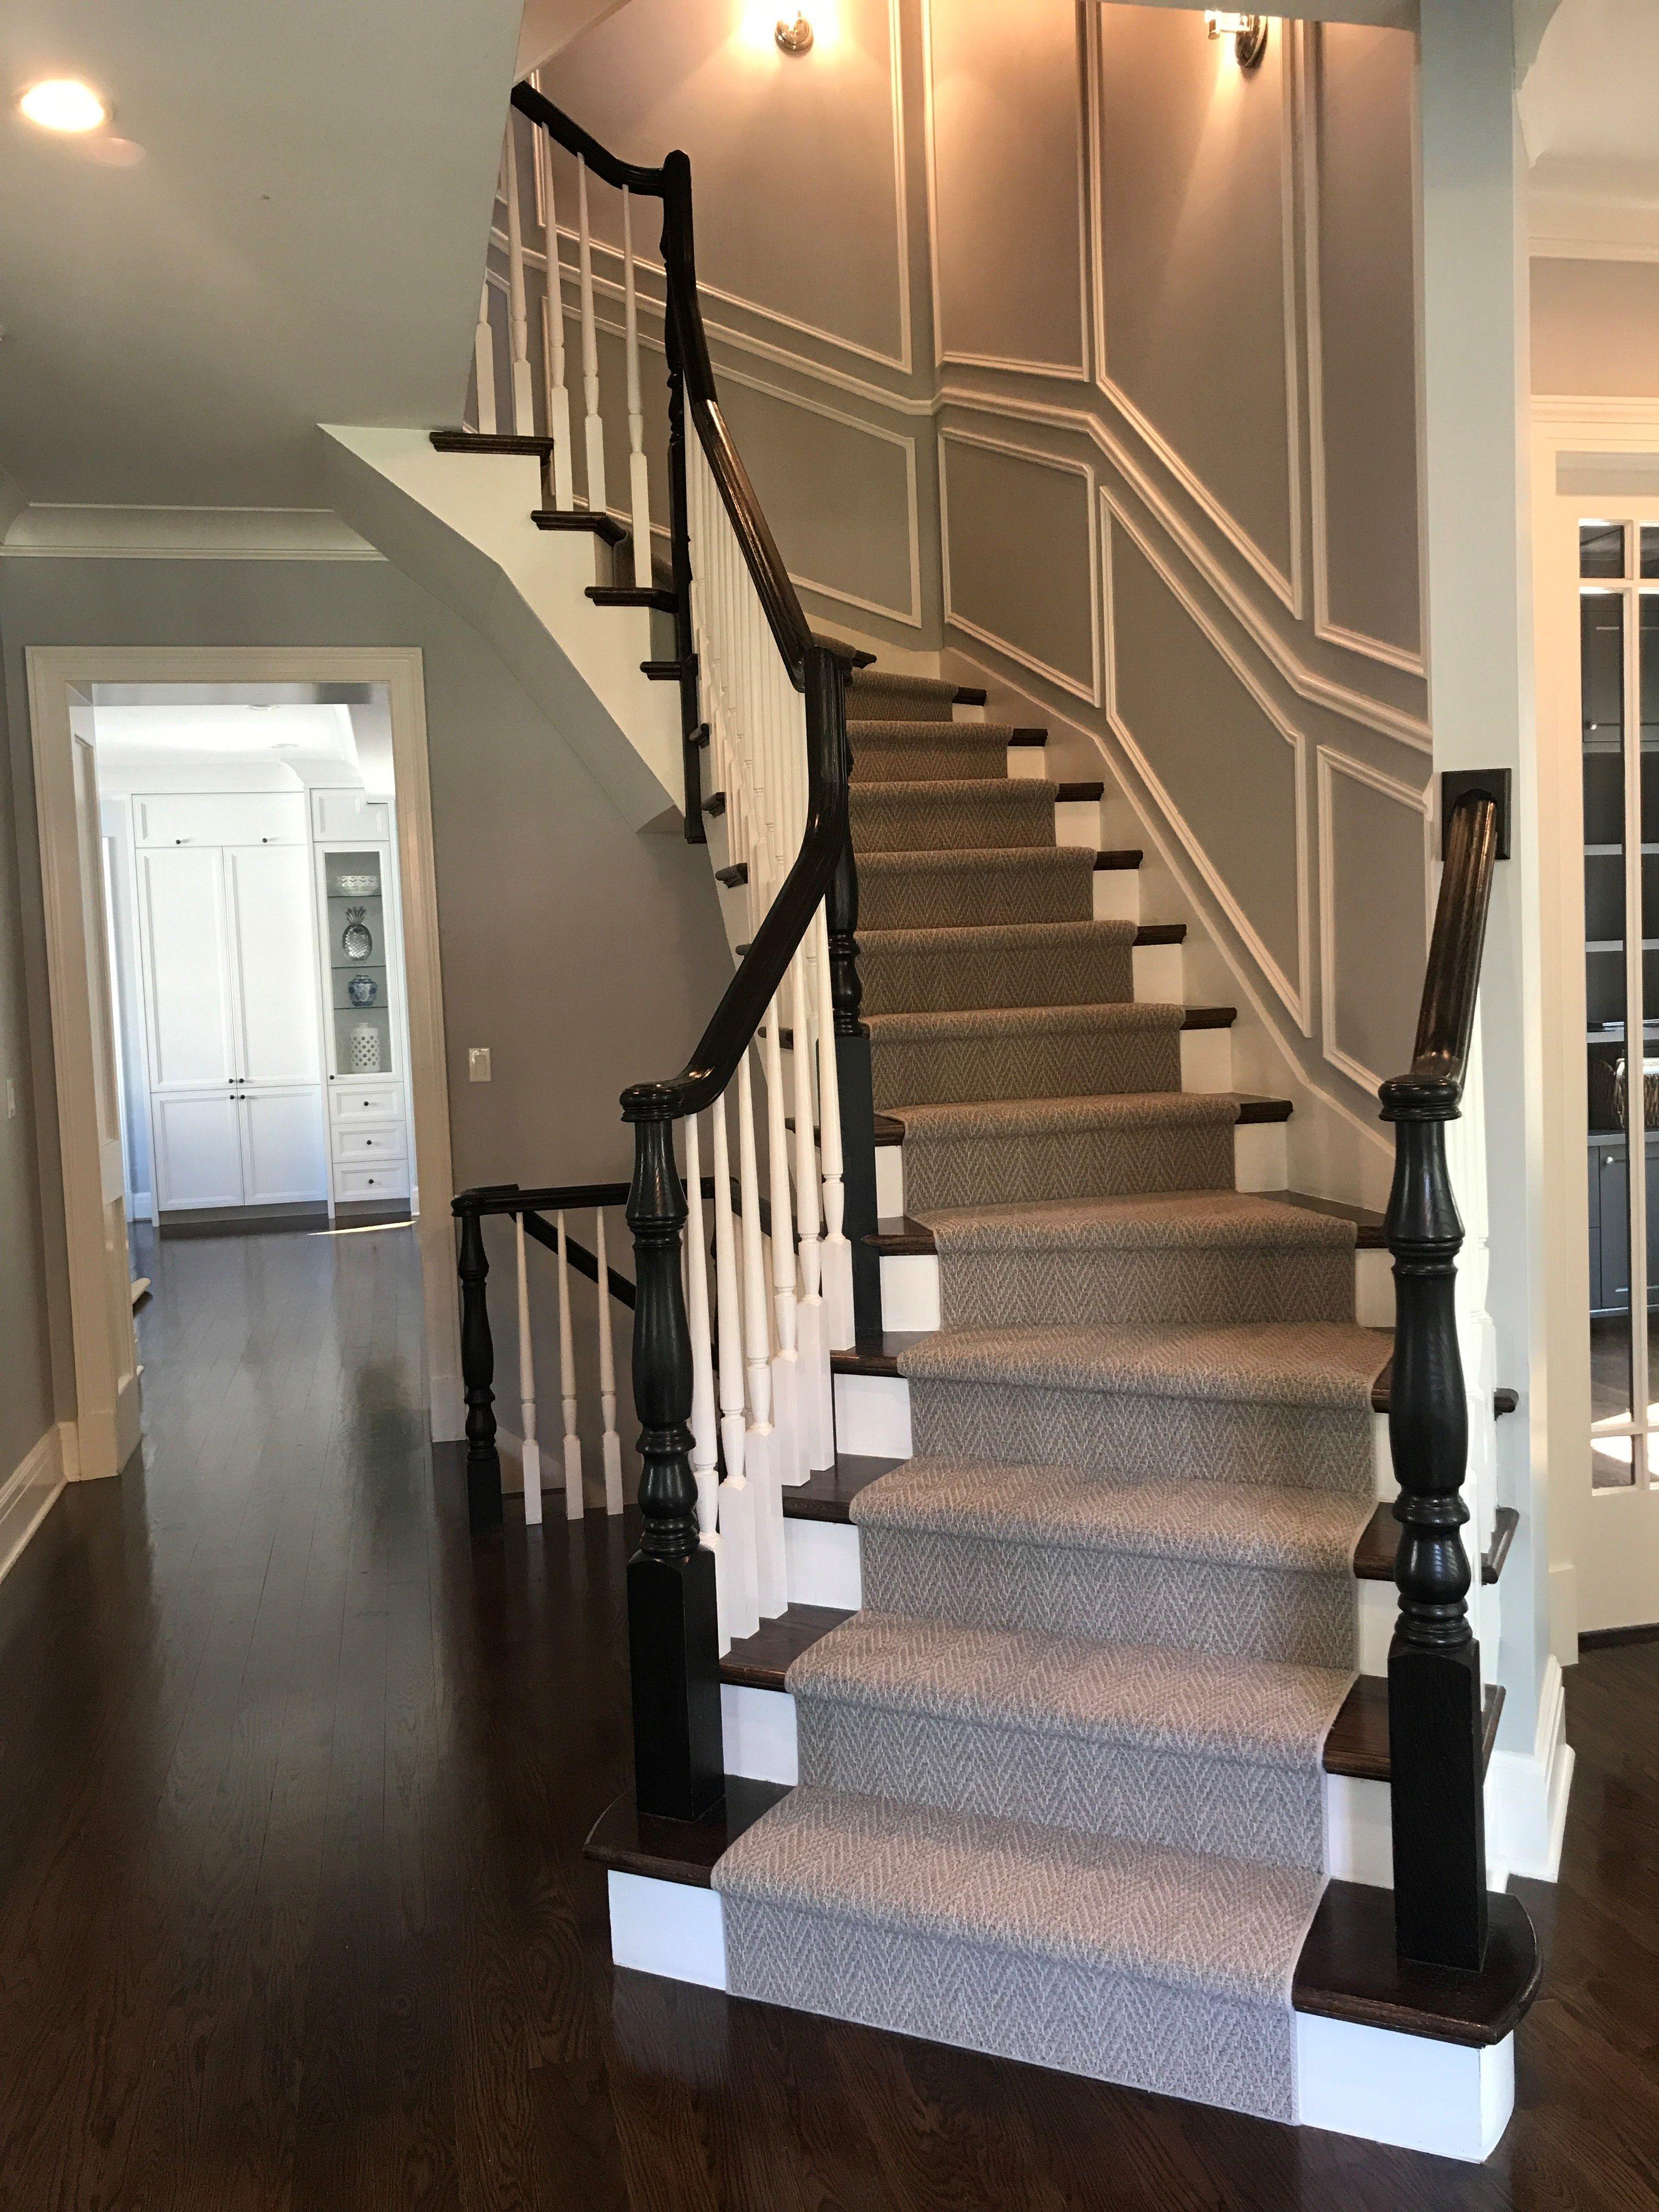 Stair Carpet Wood Wainscoting Wainscoting Stairs Florida Home